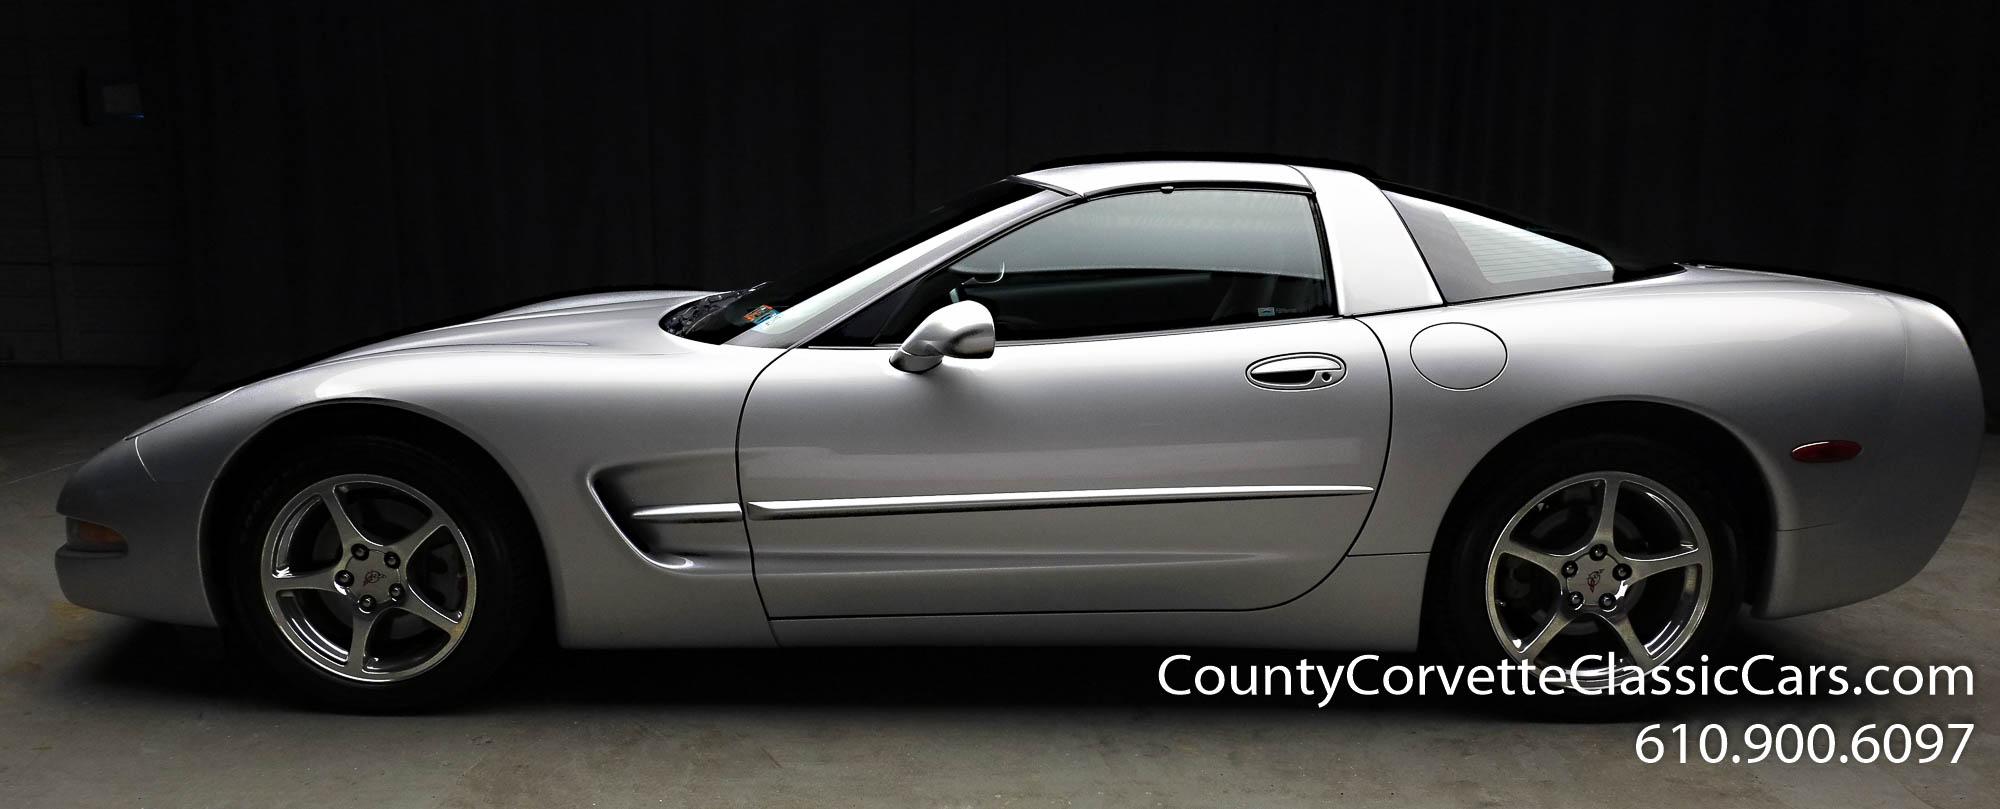 2002-Corvette-Coupe-4.jpg